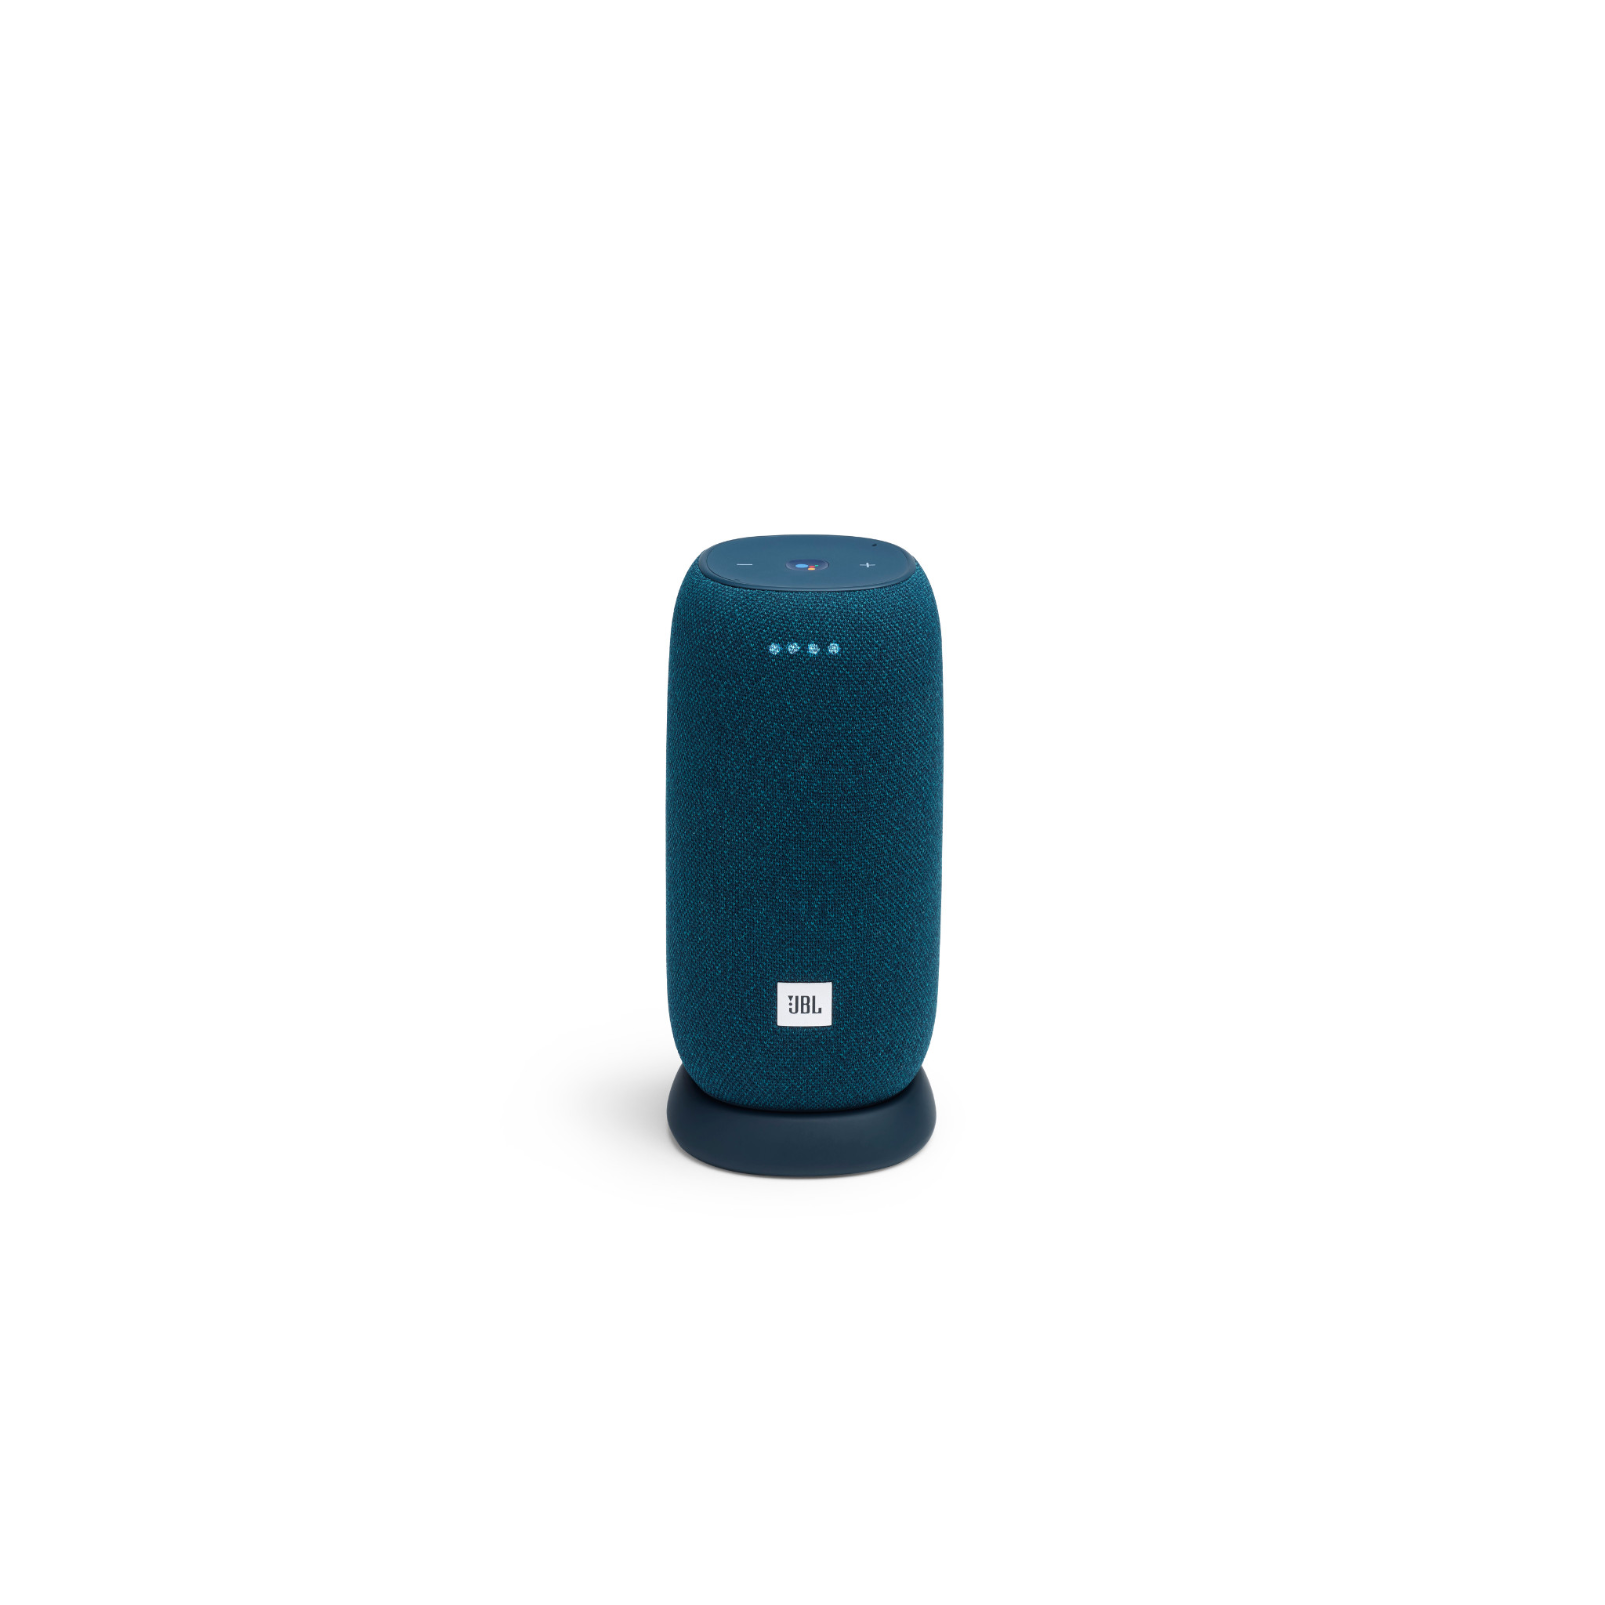 328830 jbl link portable hero blue 1605x1605 7603dd original 1567498263